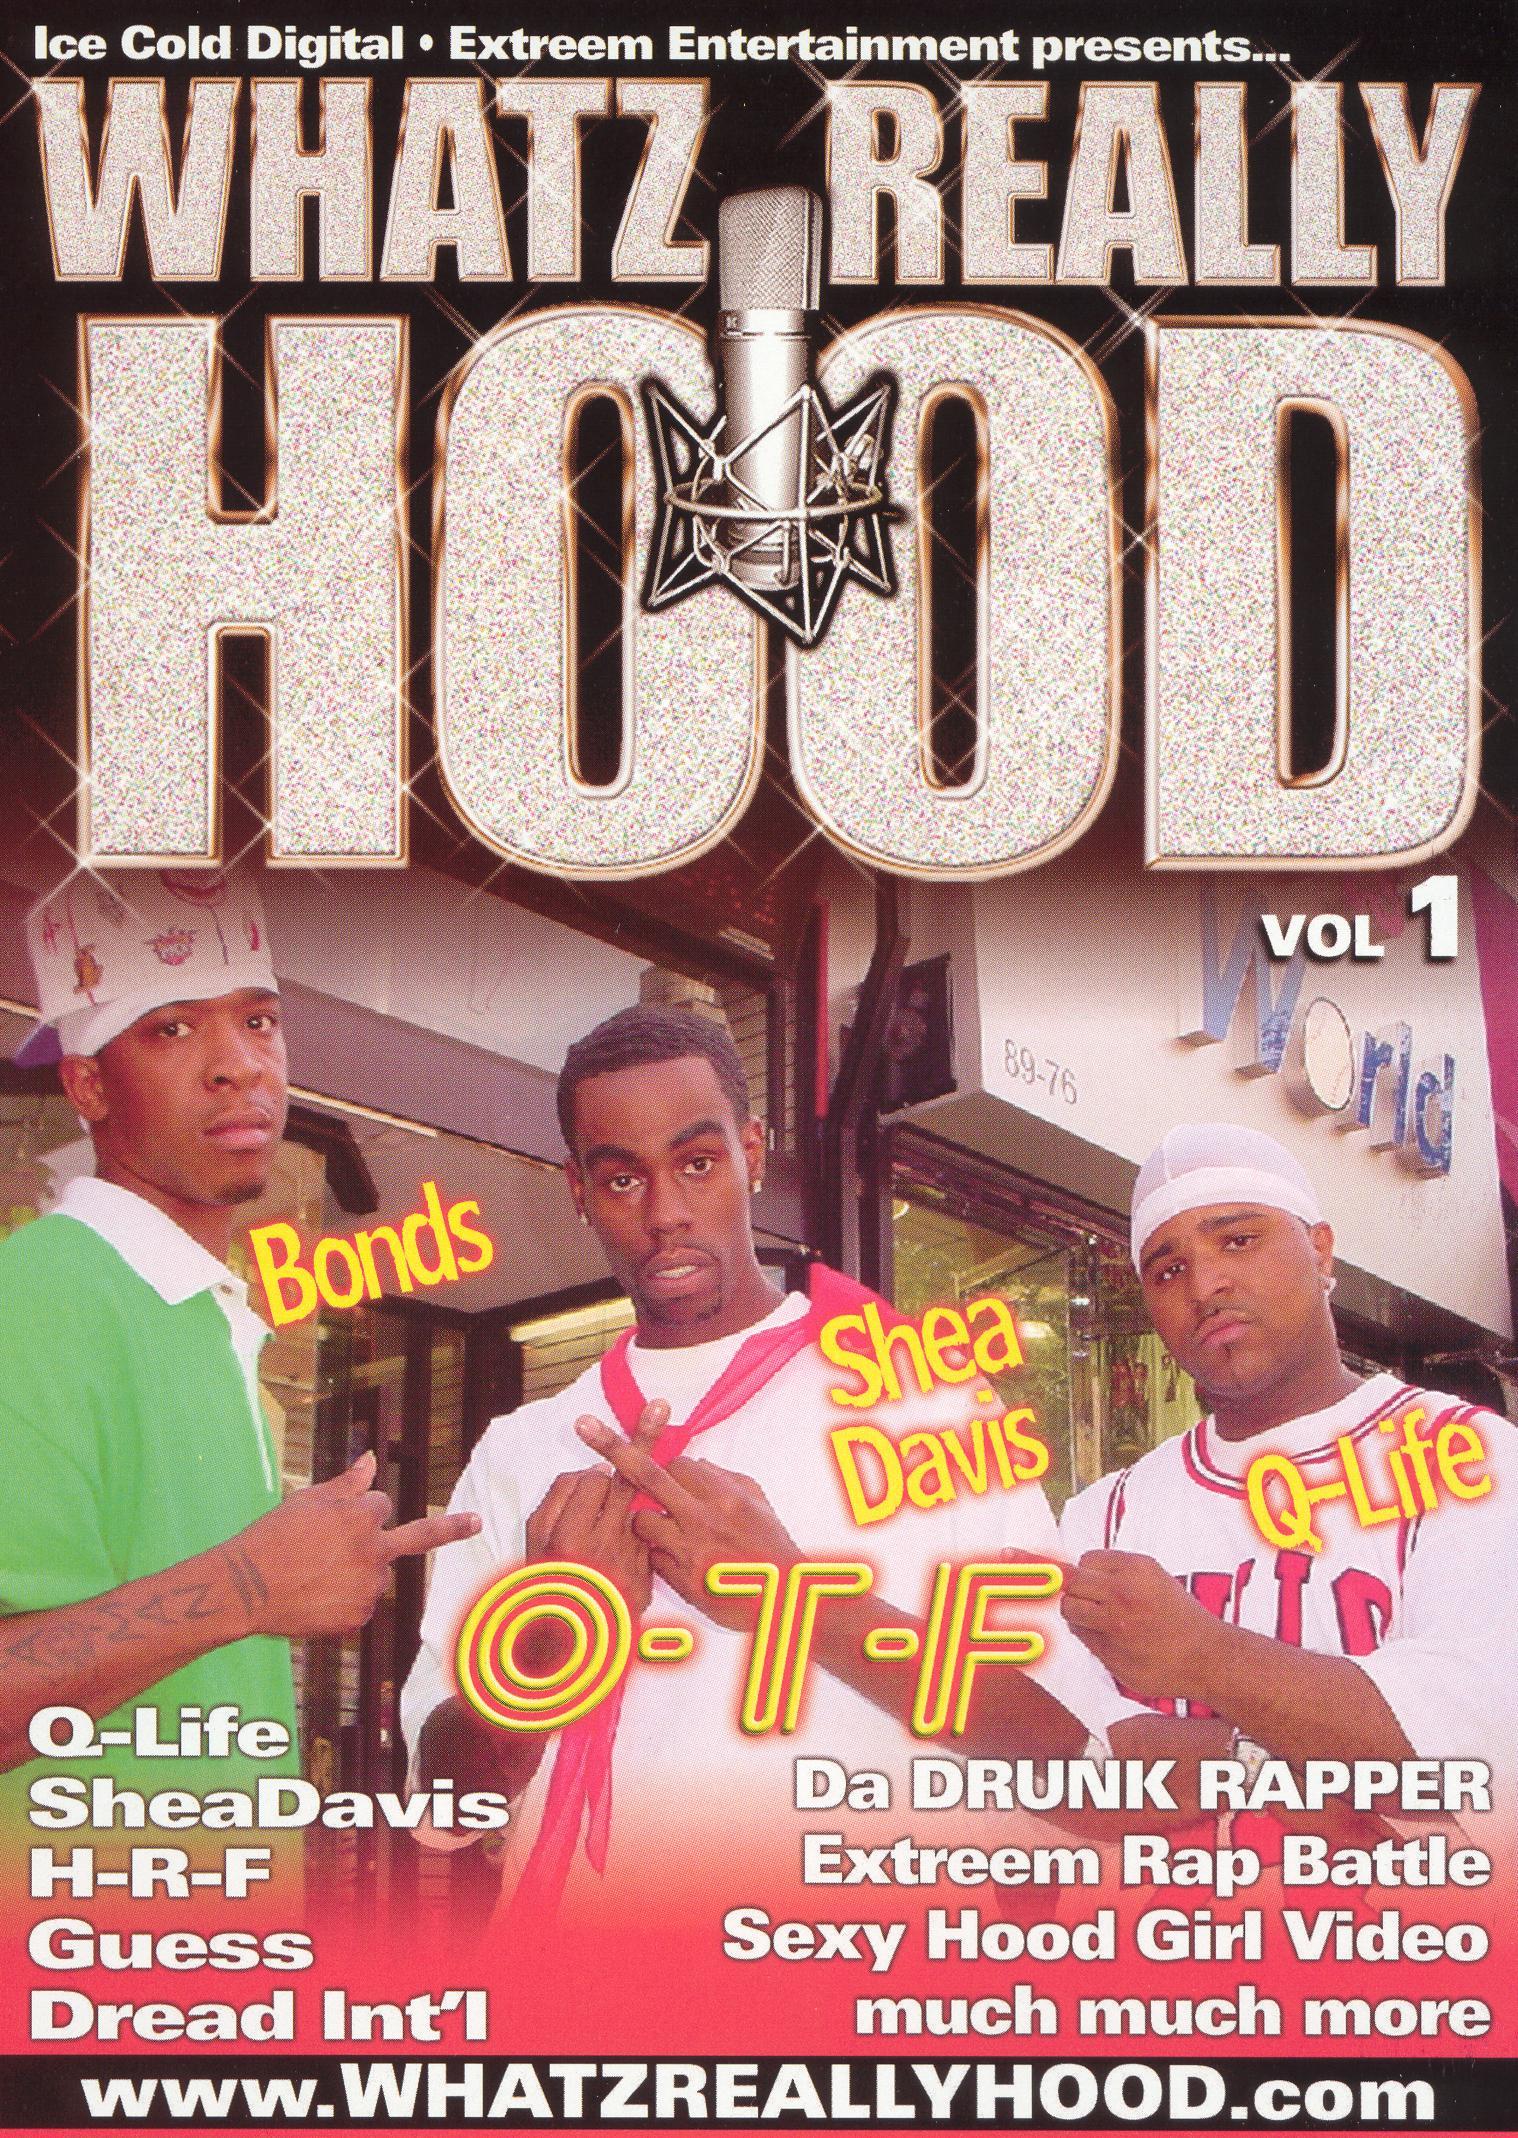 Whatz Really Hood, Vol. 1